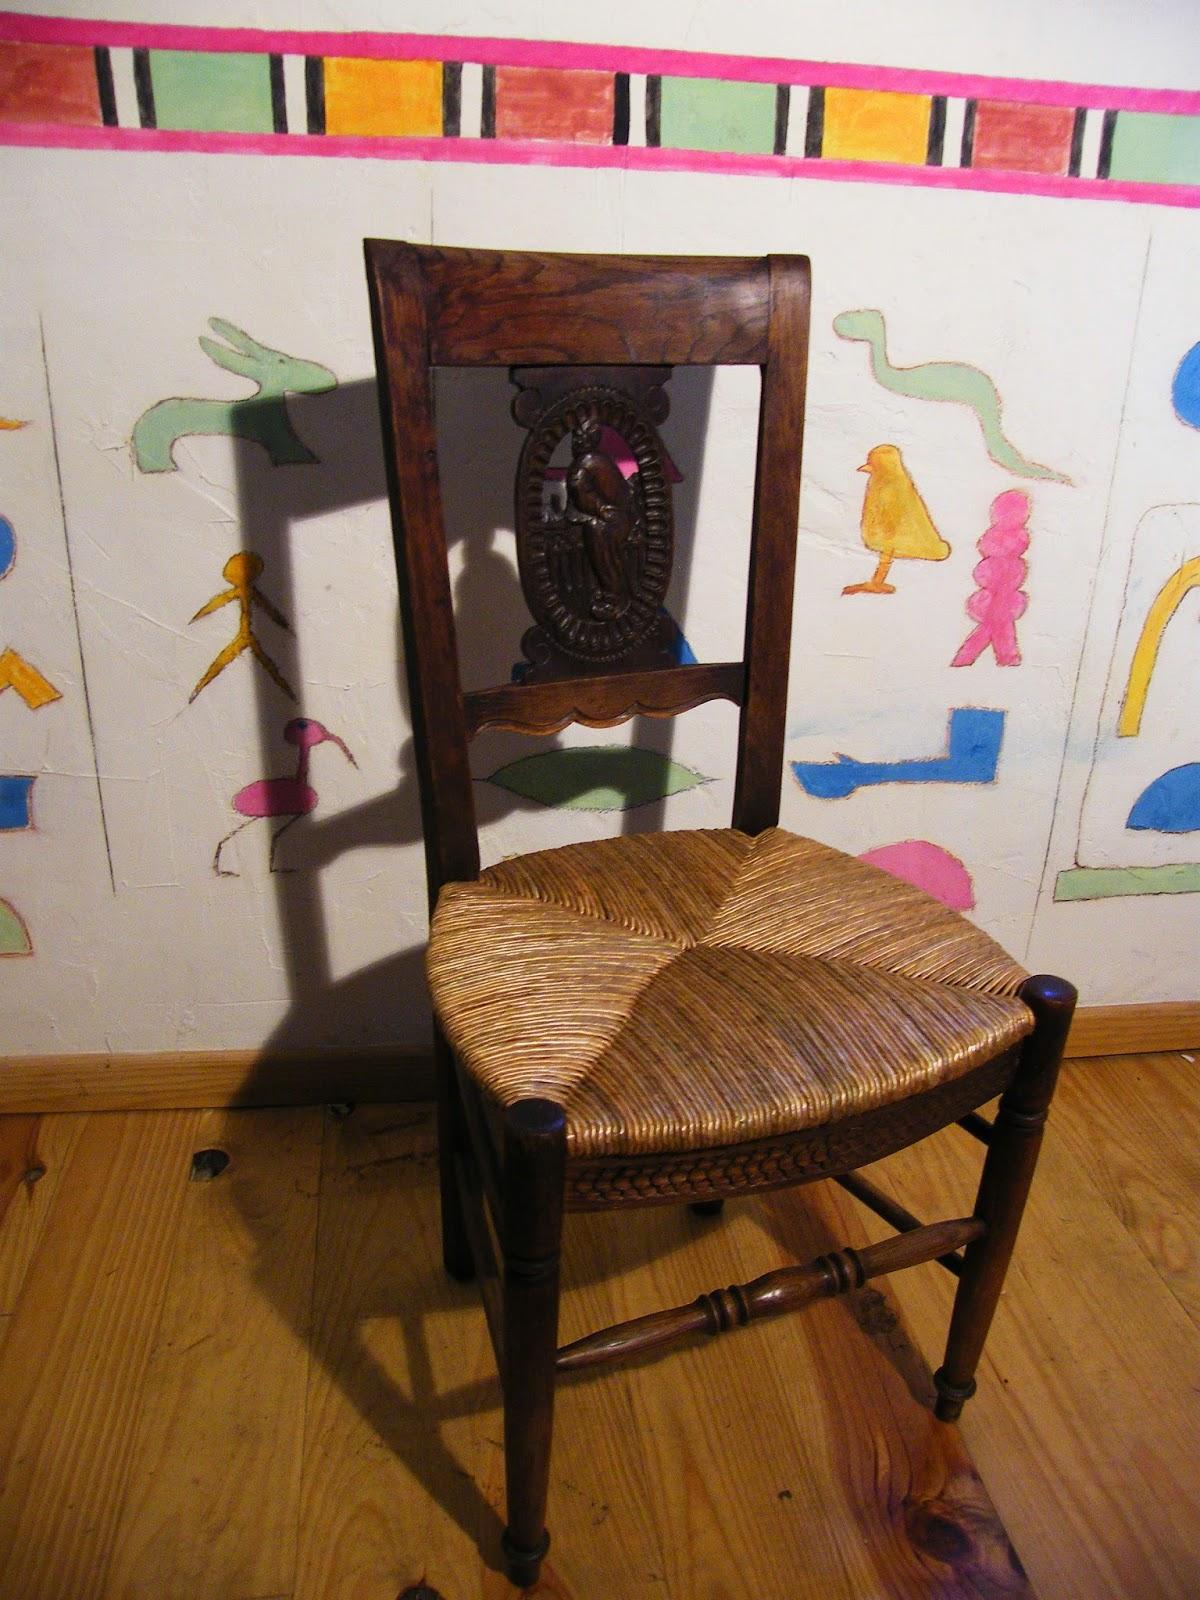 normandie cannage une chaise directoire rempaill e. Black Bedroom Furniture Sets. Home Design Ideas